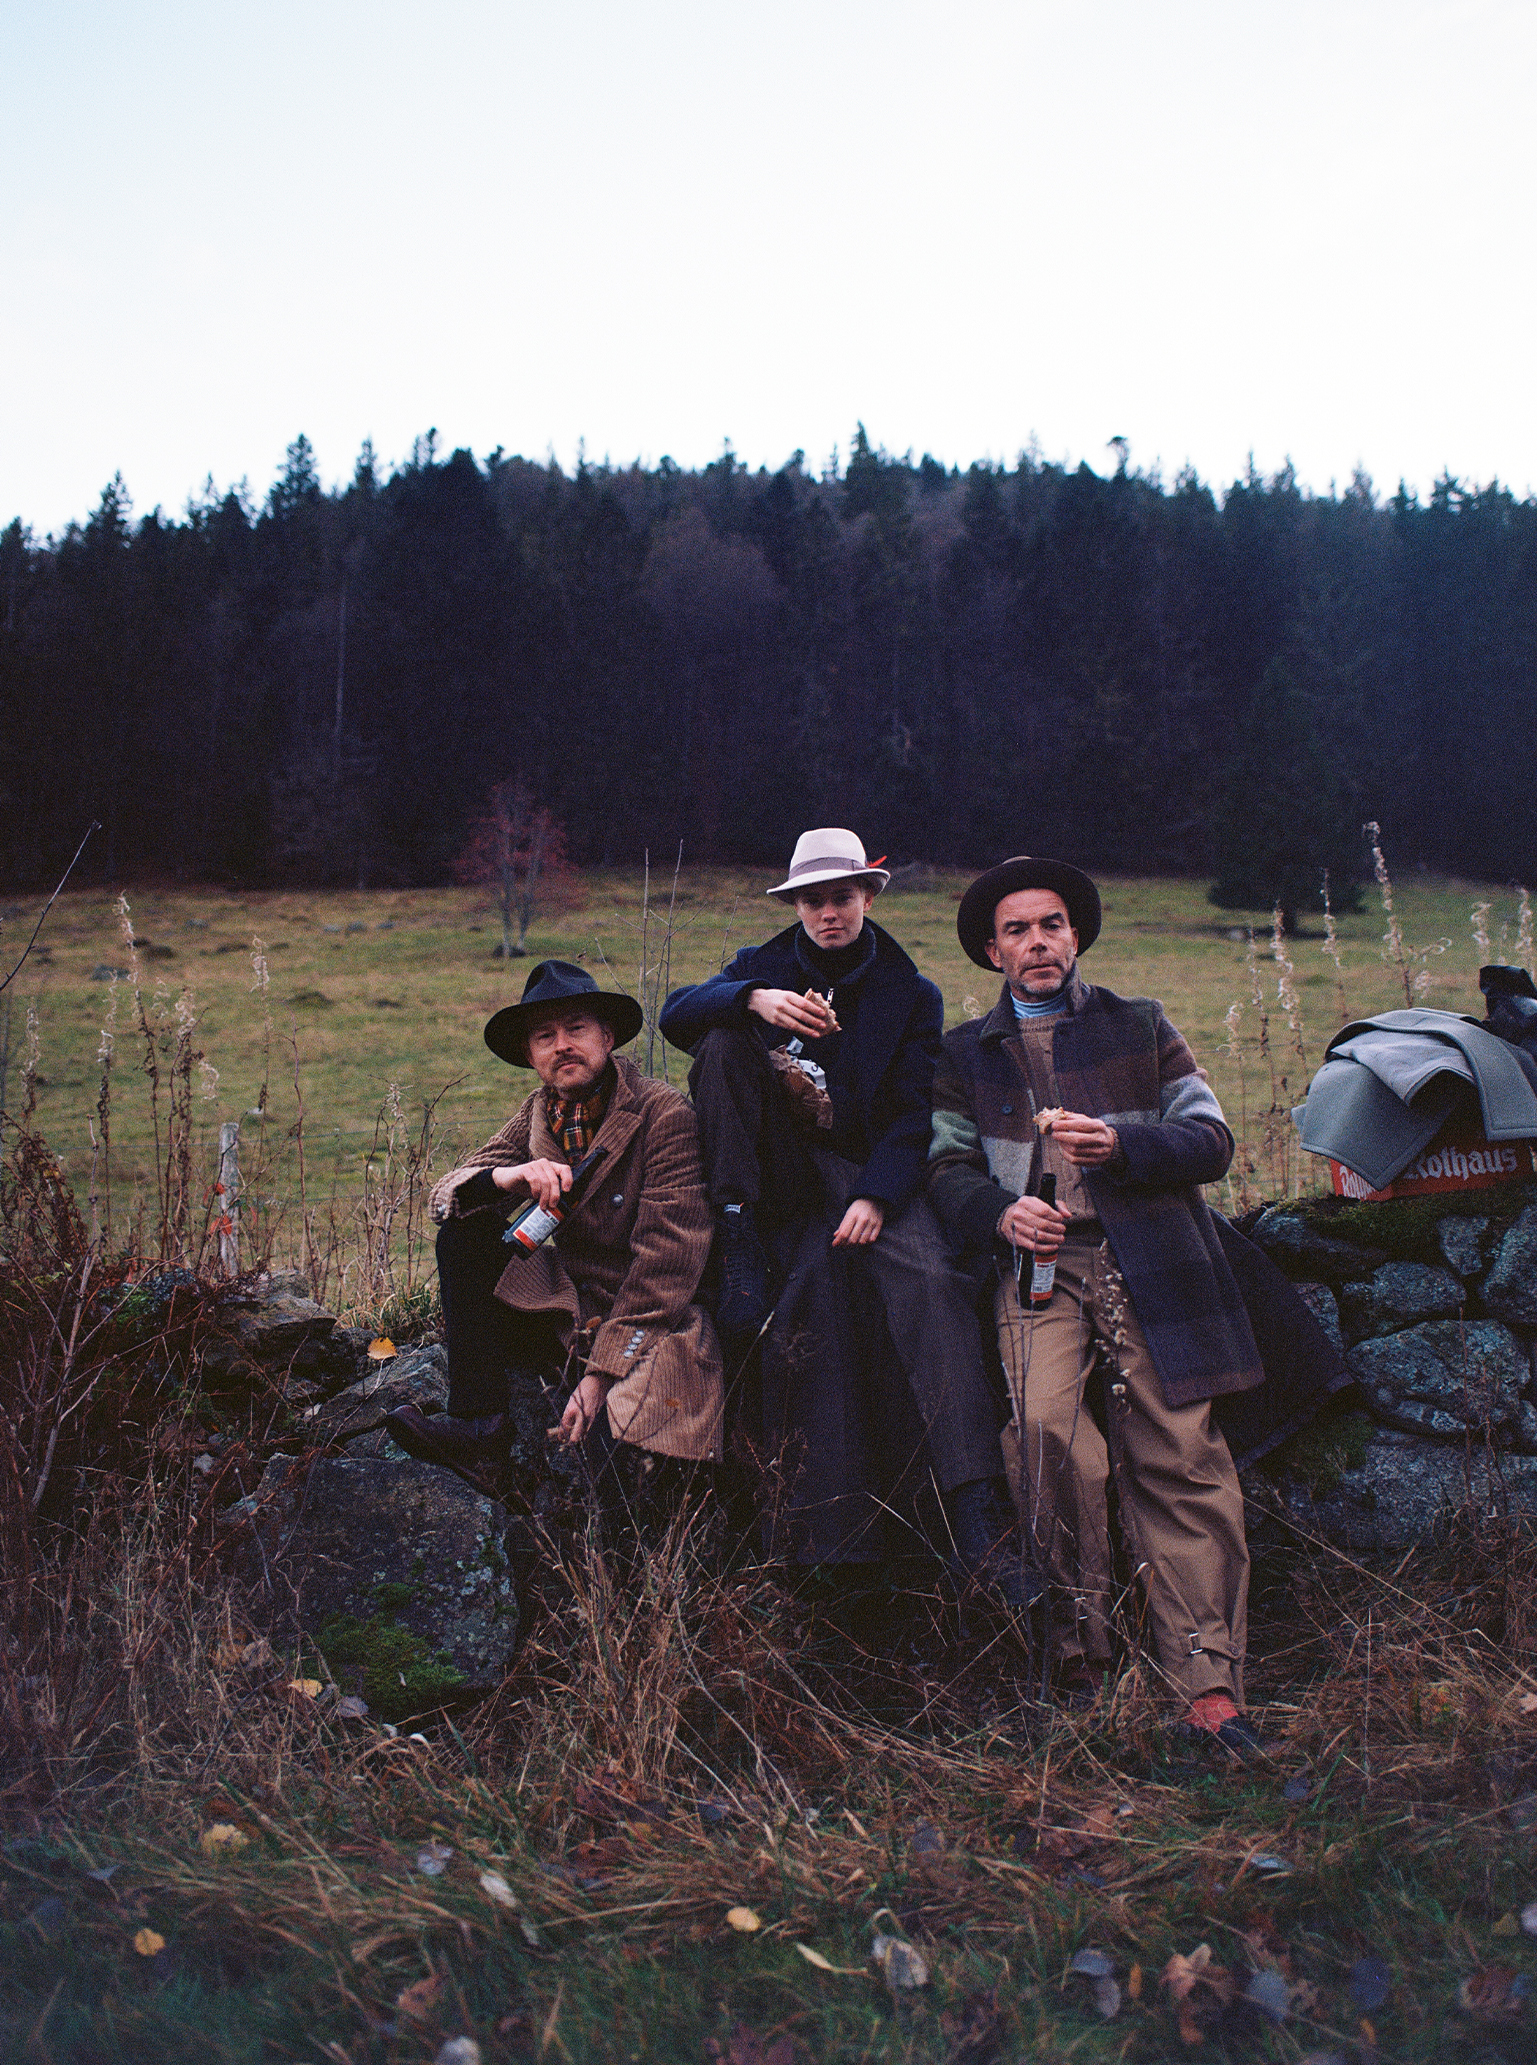 Polaroid Wanderung Schwarzwald Maike Gregor Markus Brotzeit